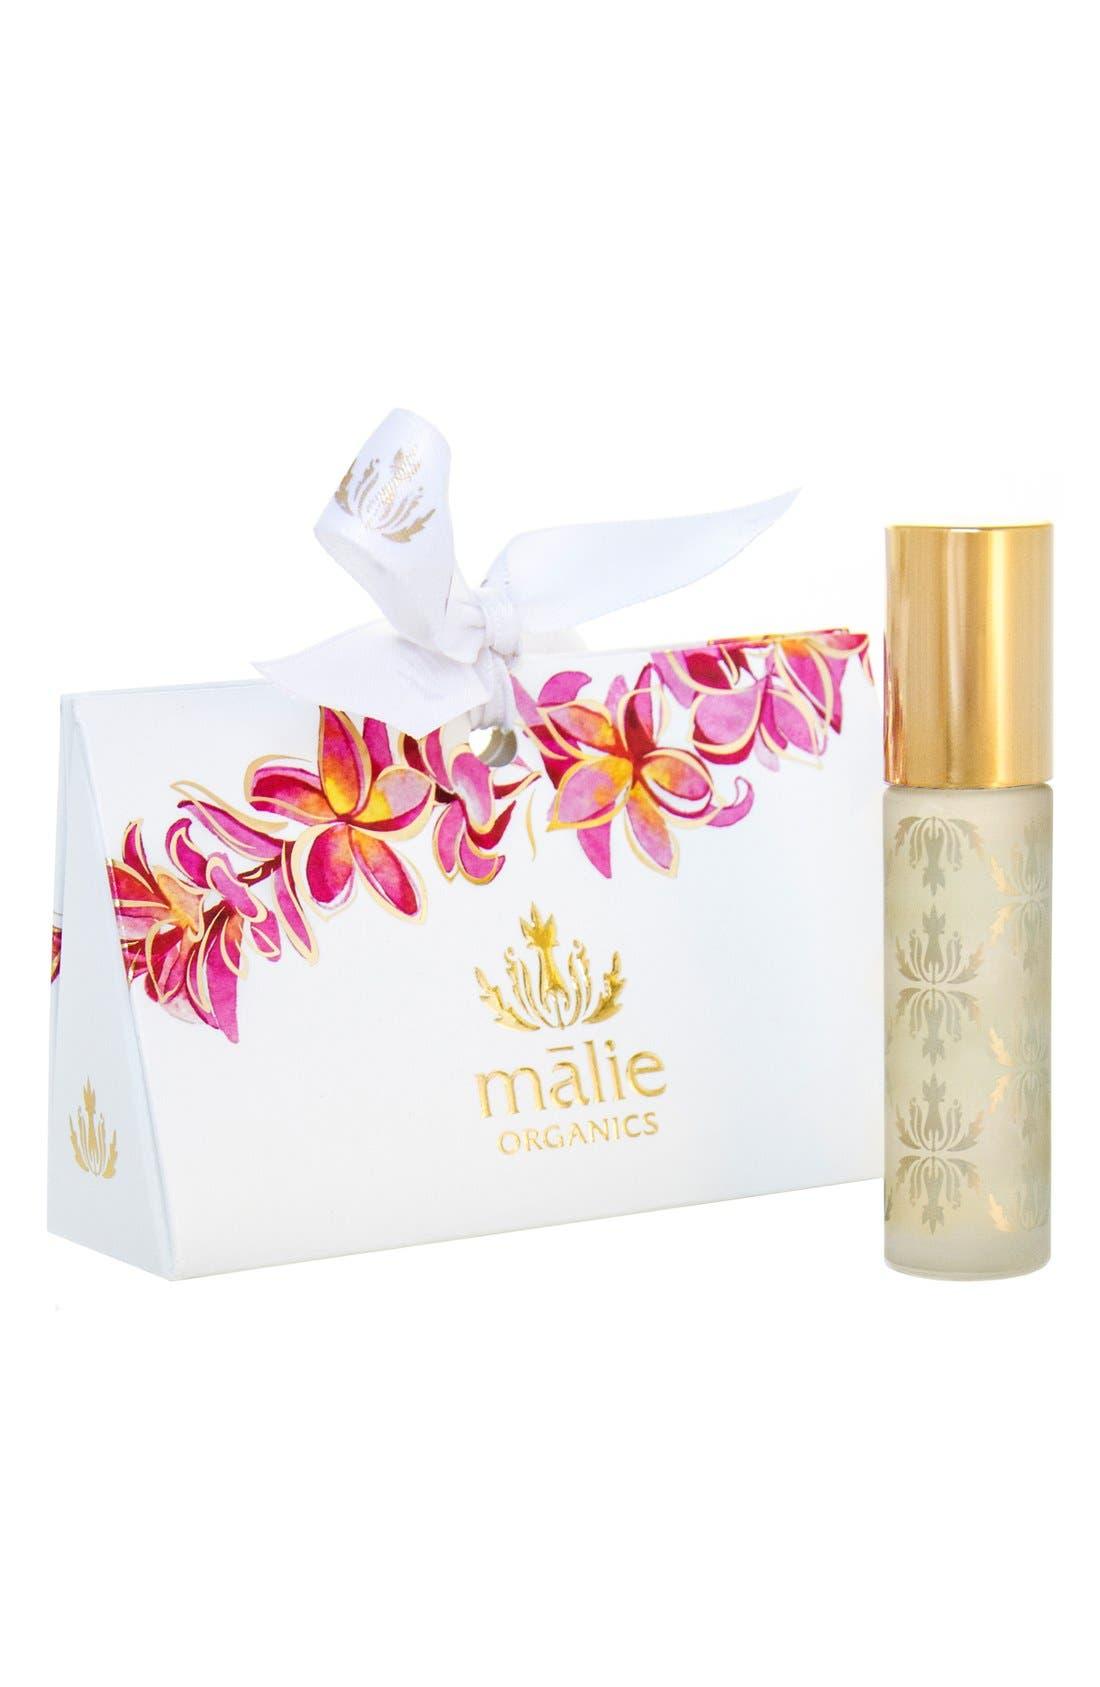 Plumeria Organic Roll-On Perfume Oil,                             Main thumbnail 1, color,